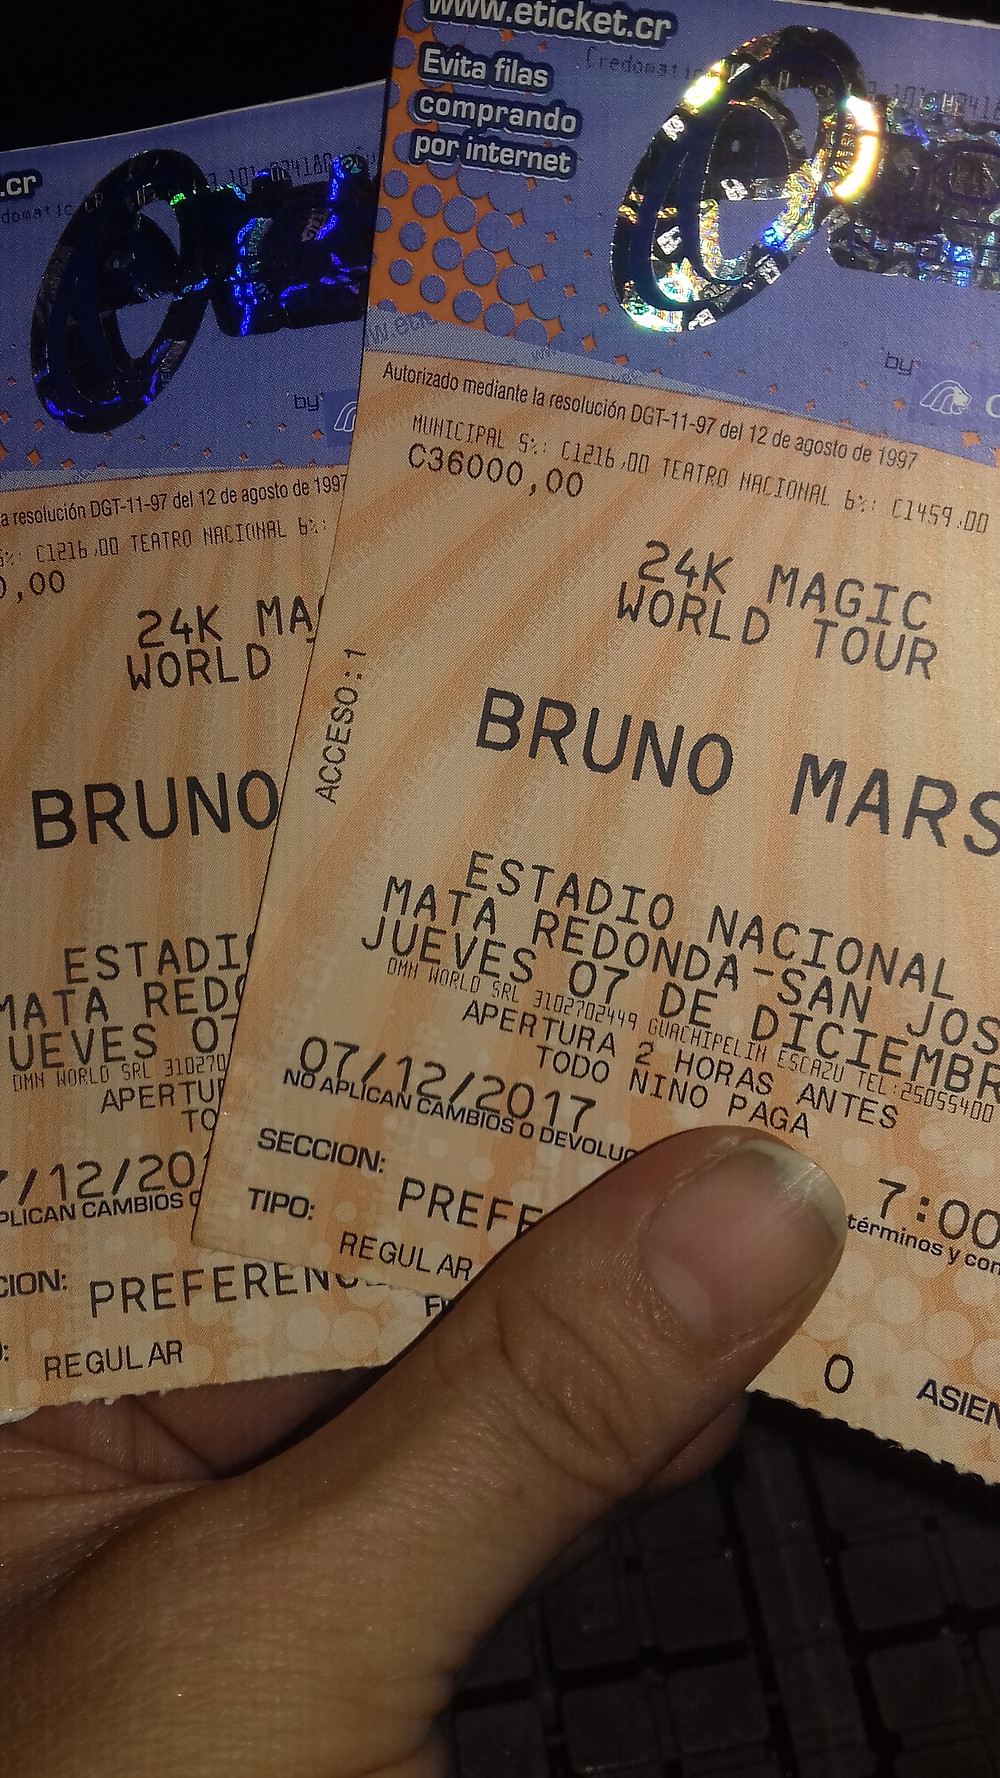 Bruno Mars en Costa Rica 2017